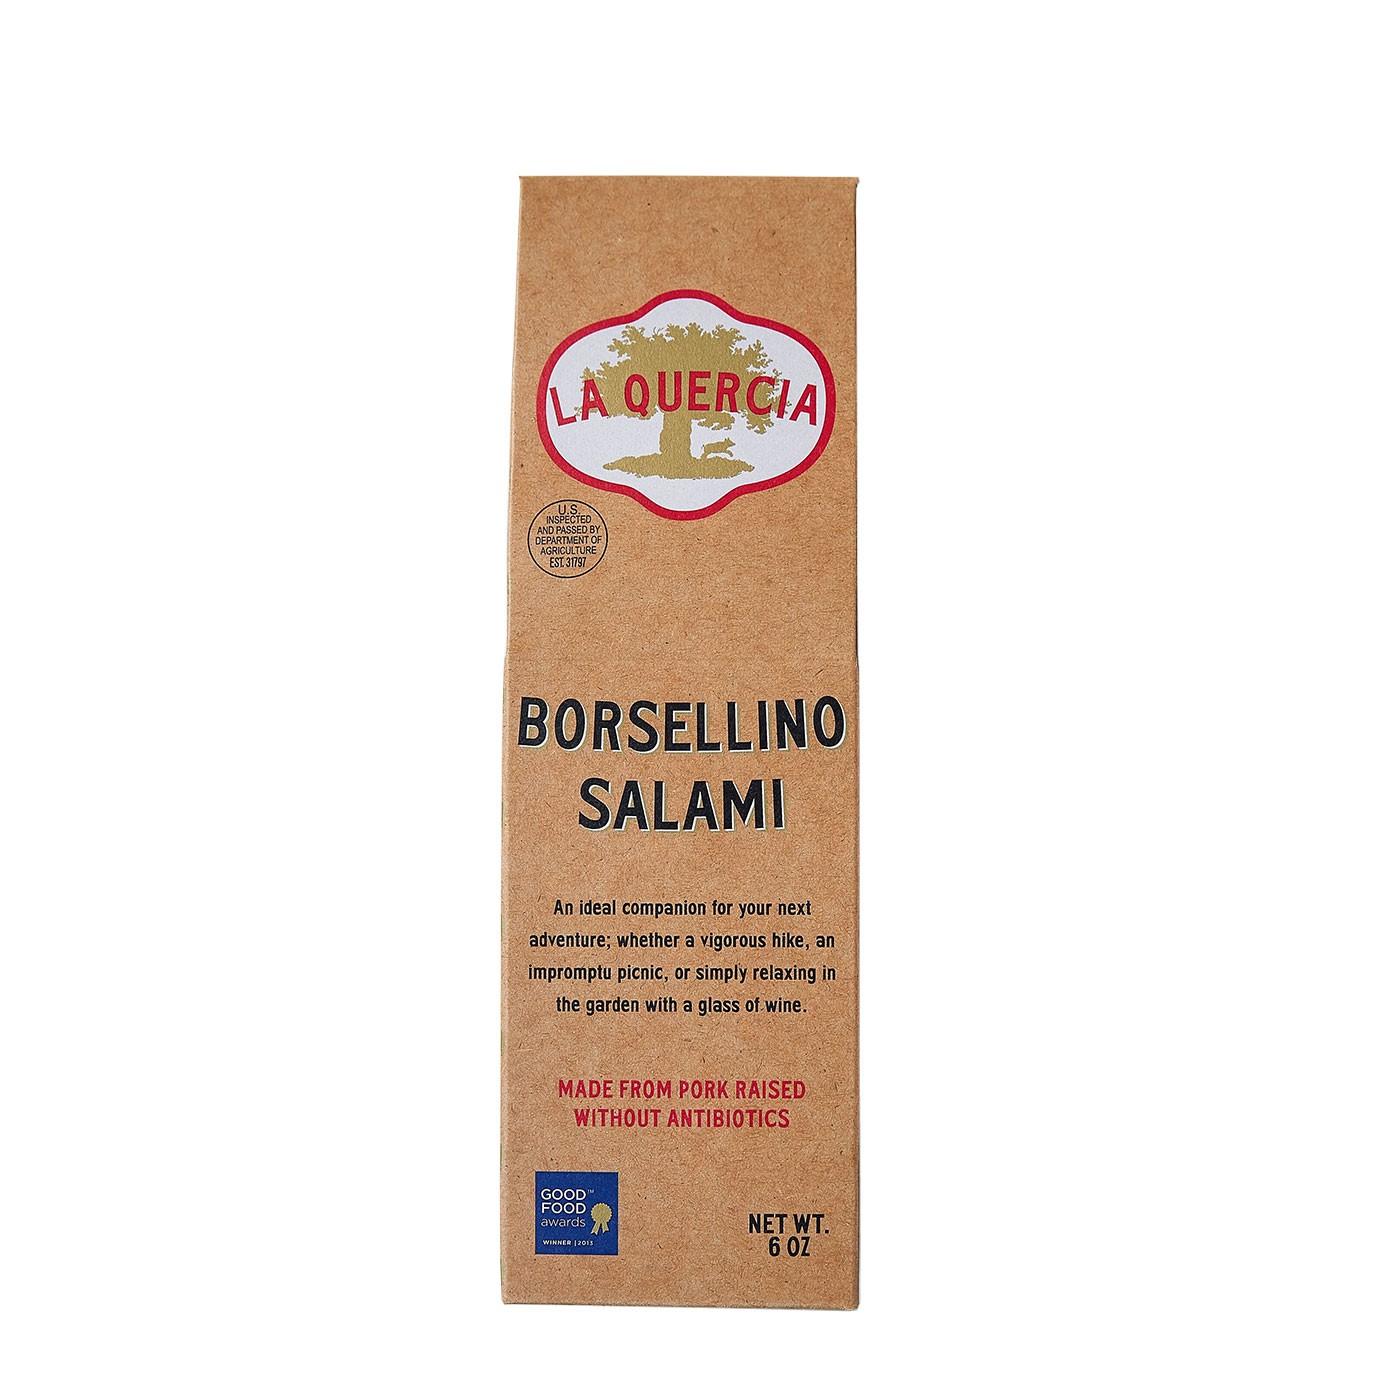 Salame Borsellino 6 oz